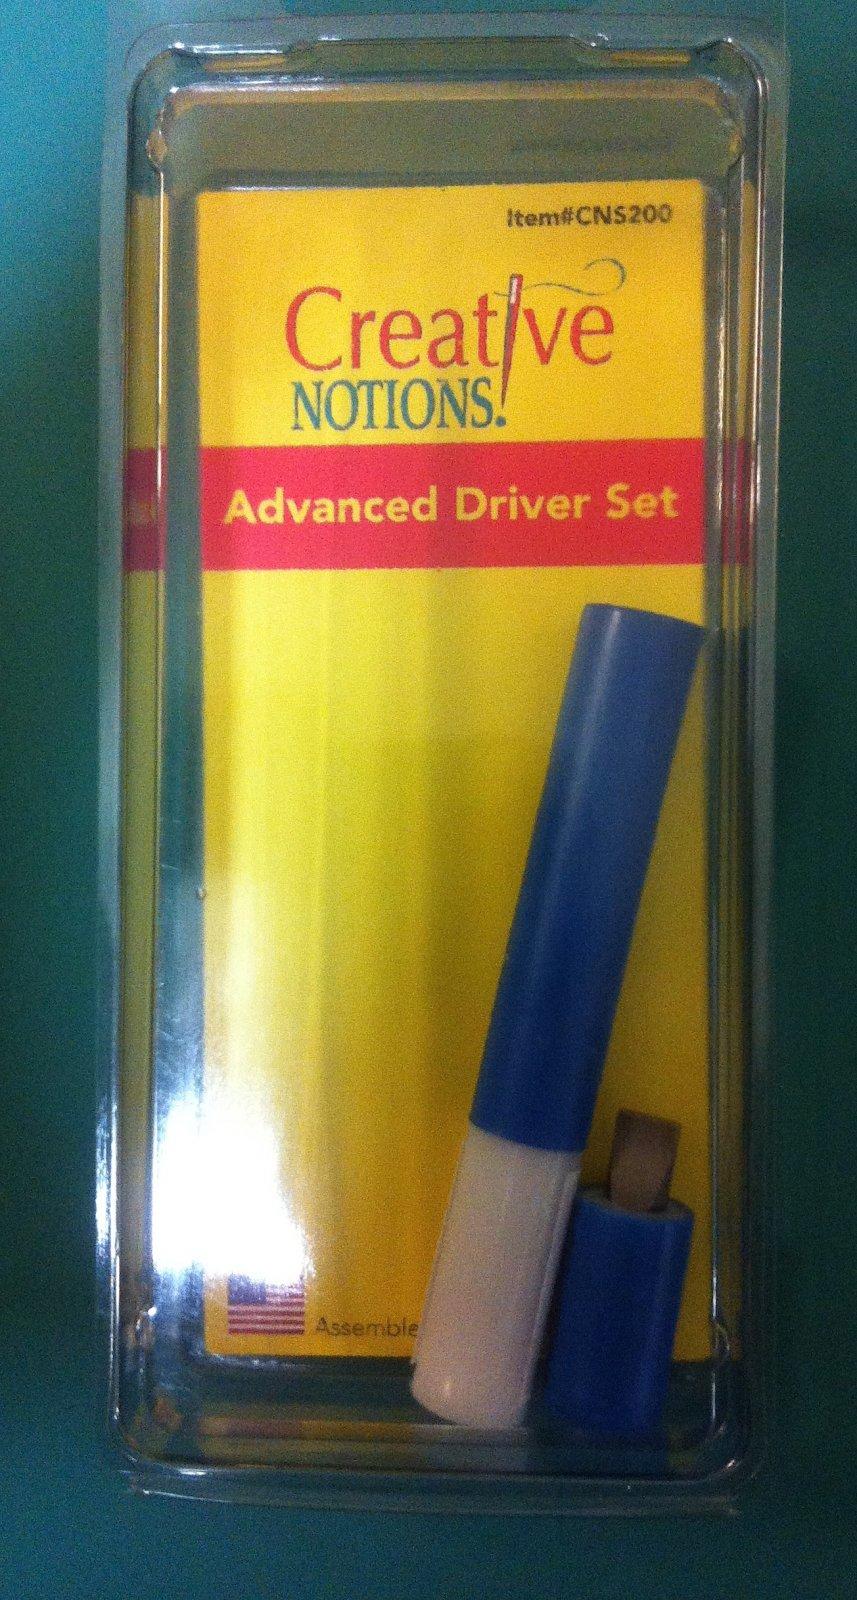 Advanced Driver Set